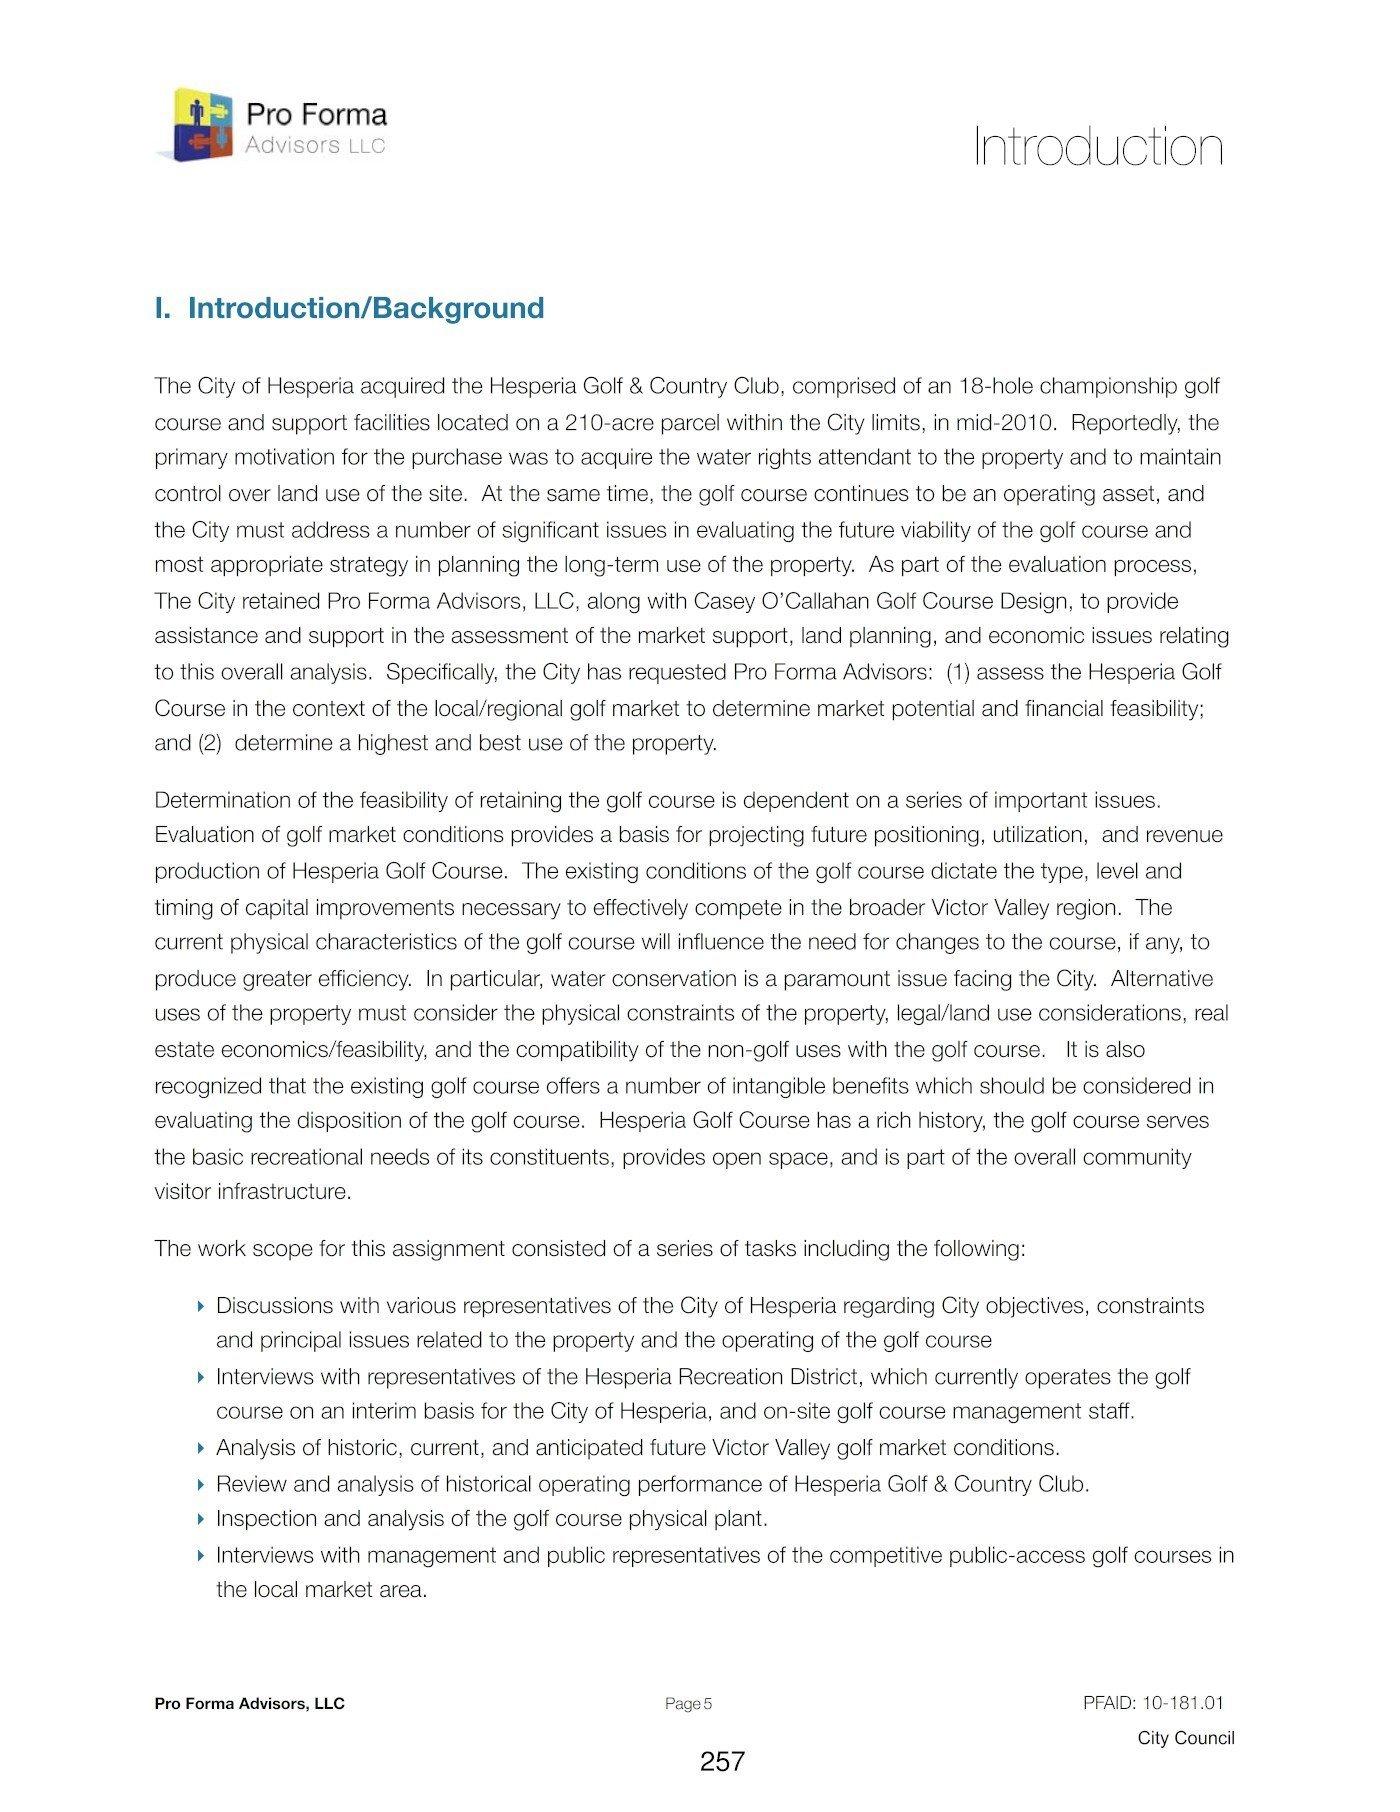 Hesperia Golf Analysis - Introduction 1 of 2